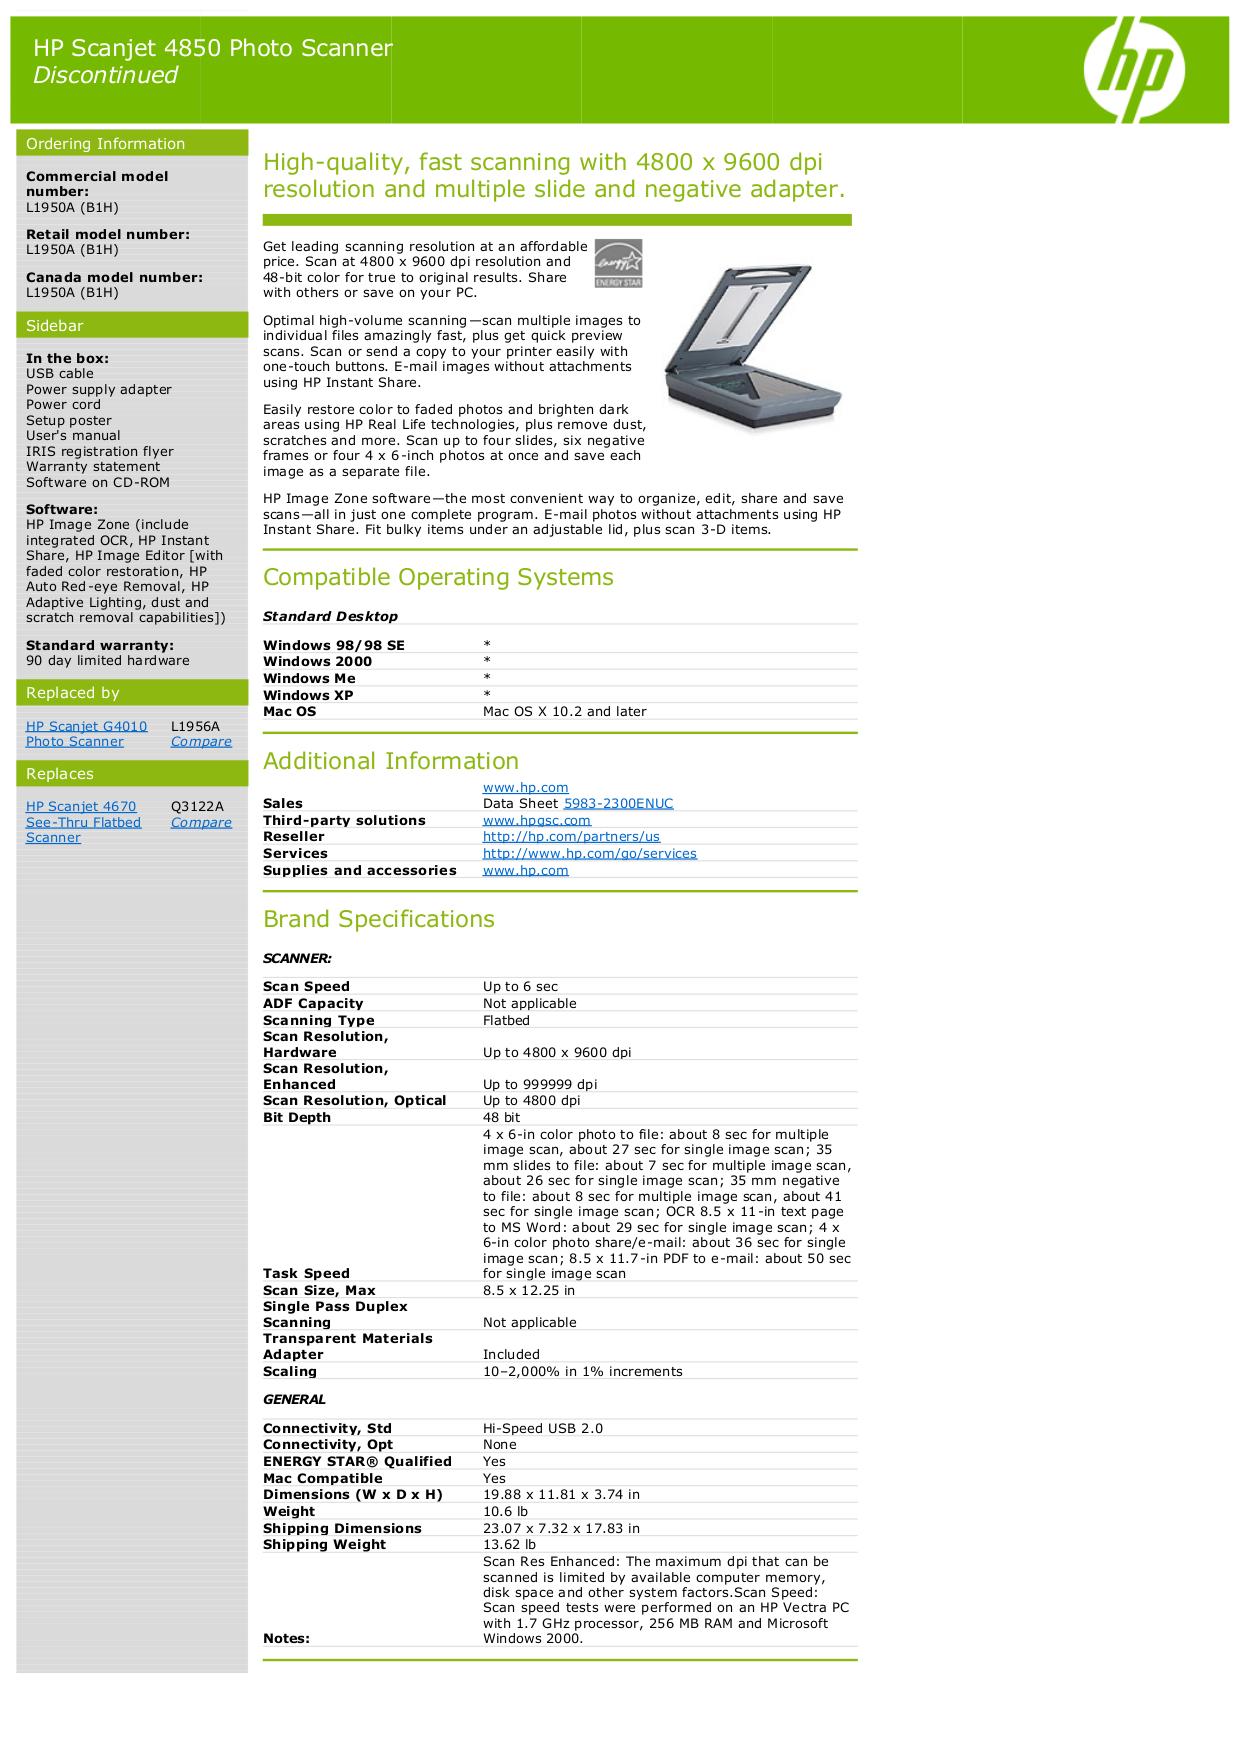 Download Free Pdf For Hp Scanjet 4850 Scanner Manual border=